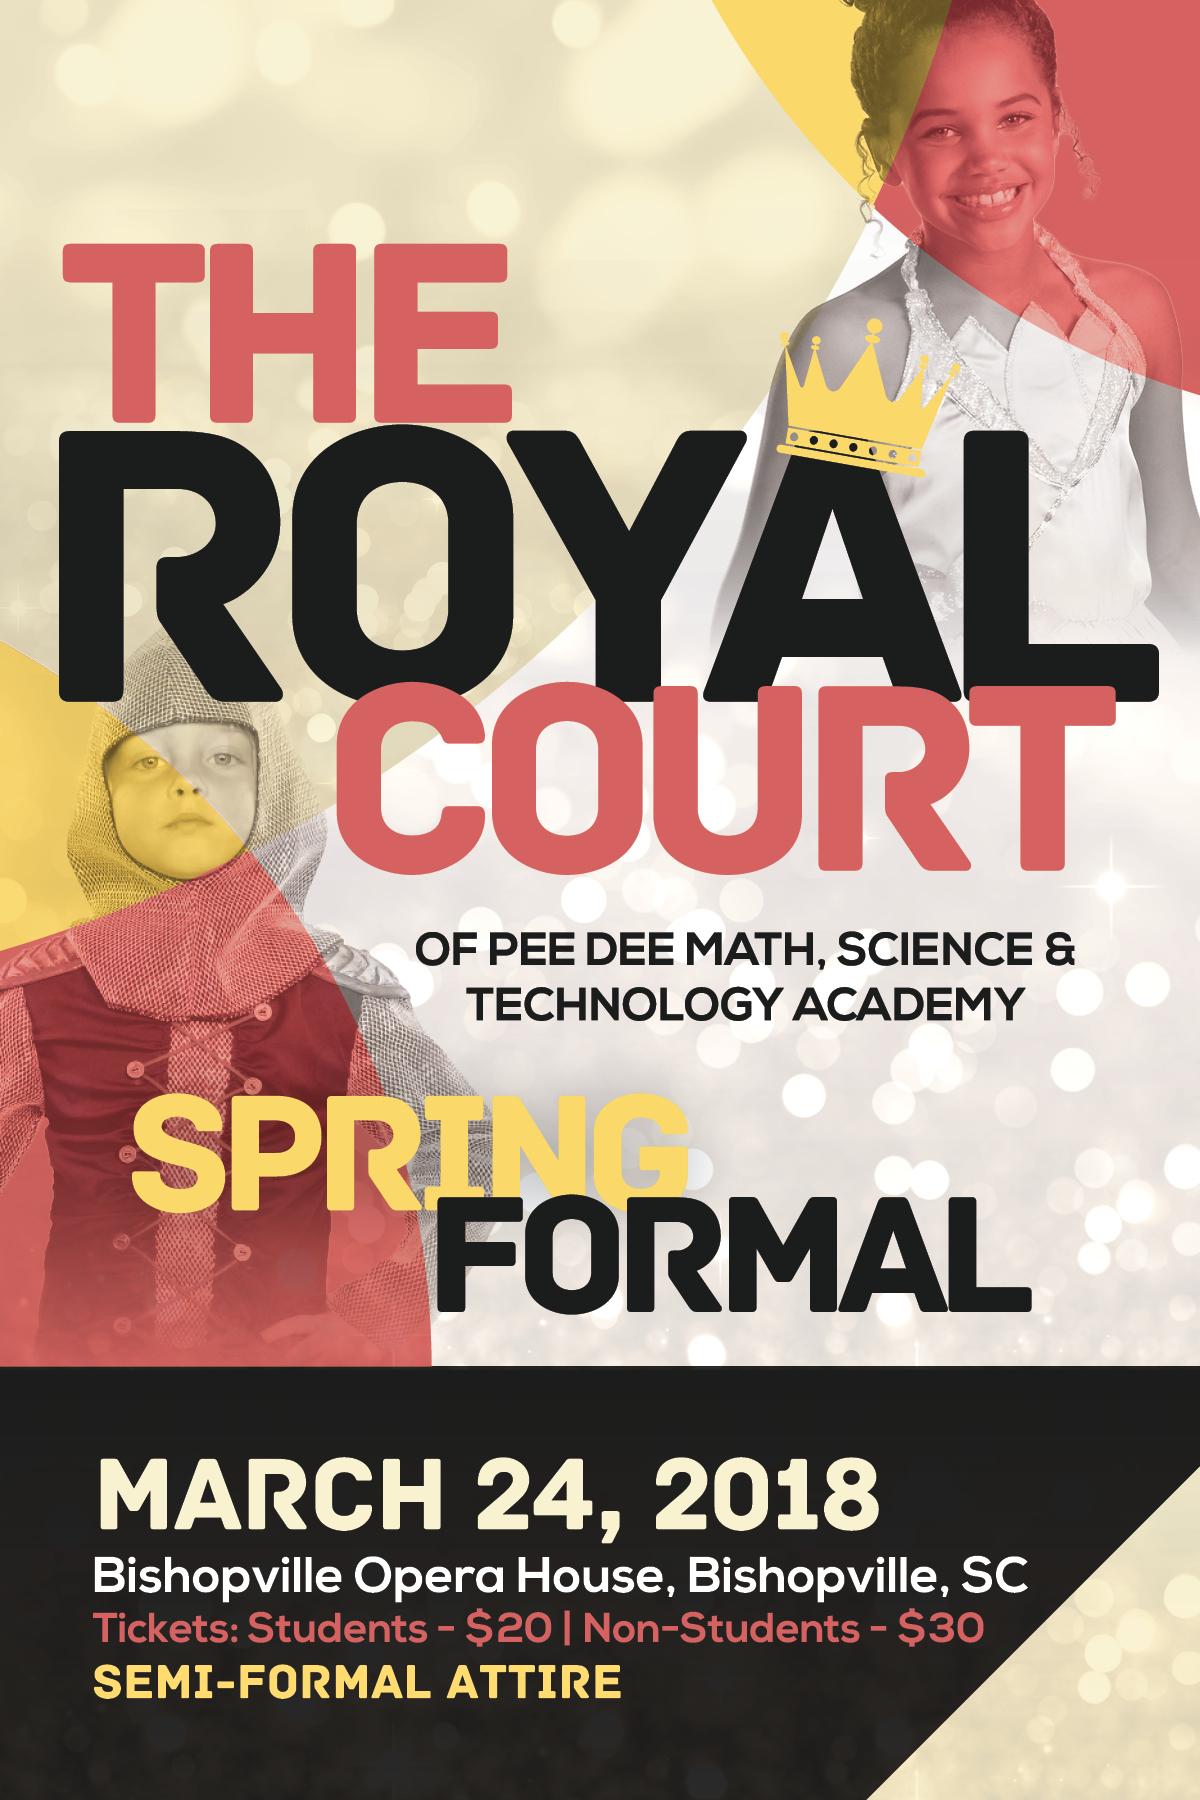 Spring Formal 2018